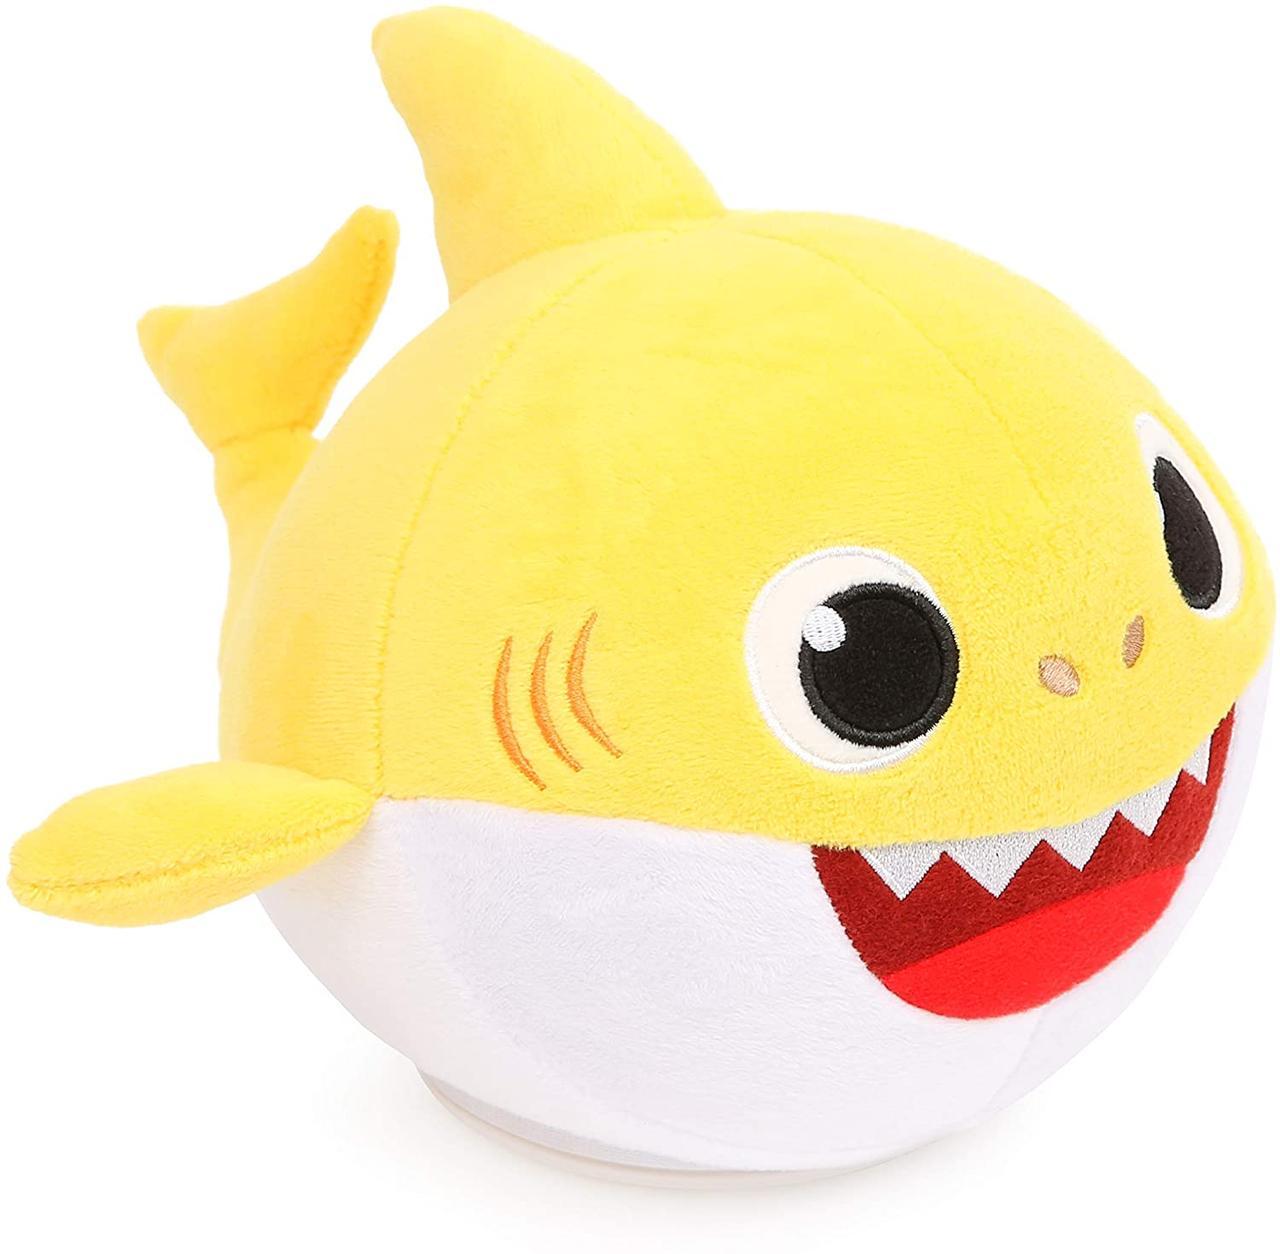 Интерактивная мягкая игрушка Baby Shark – танцующий малыш Акуленок (MBS-01002.INTL)